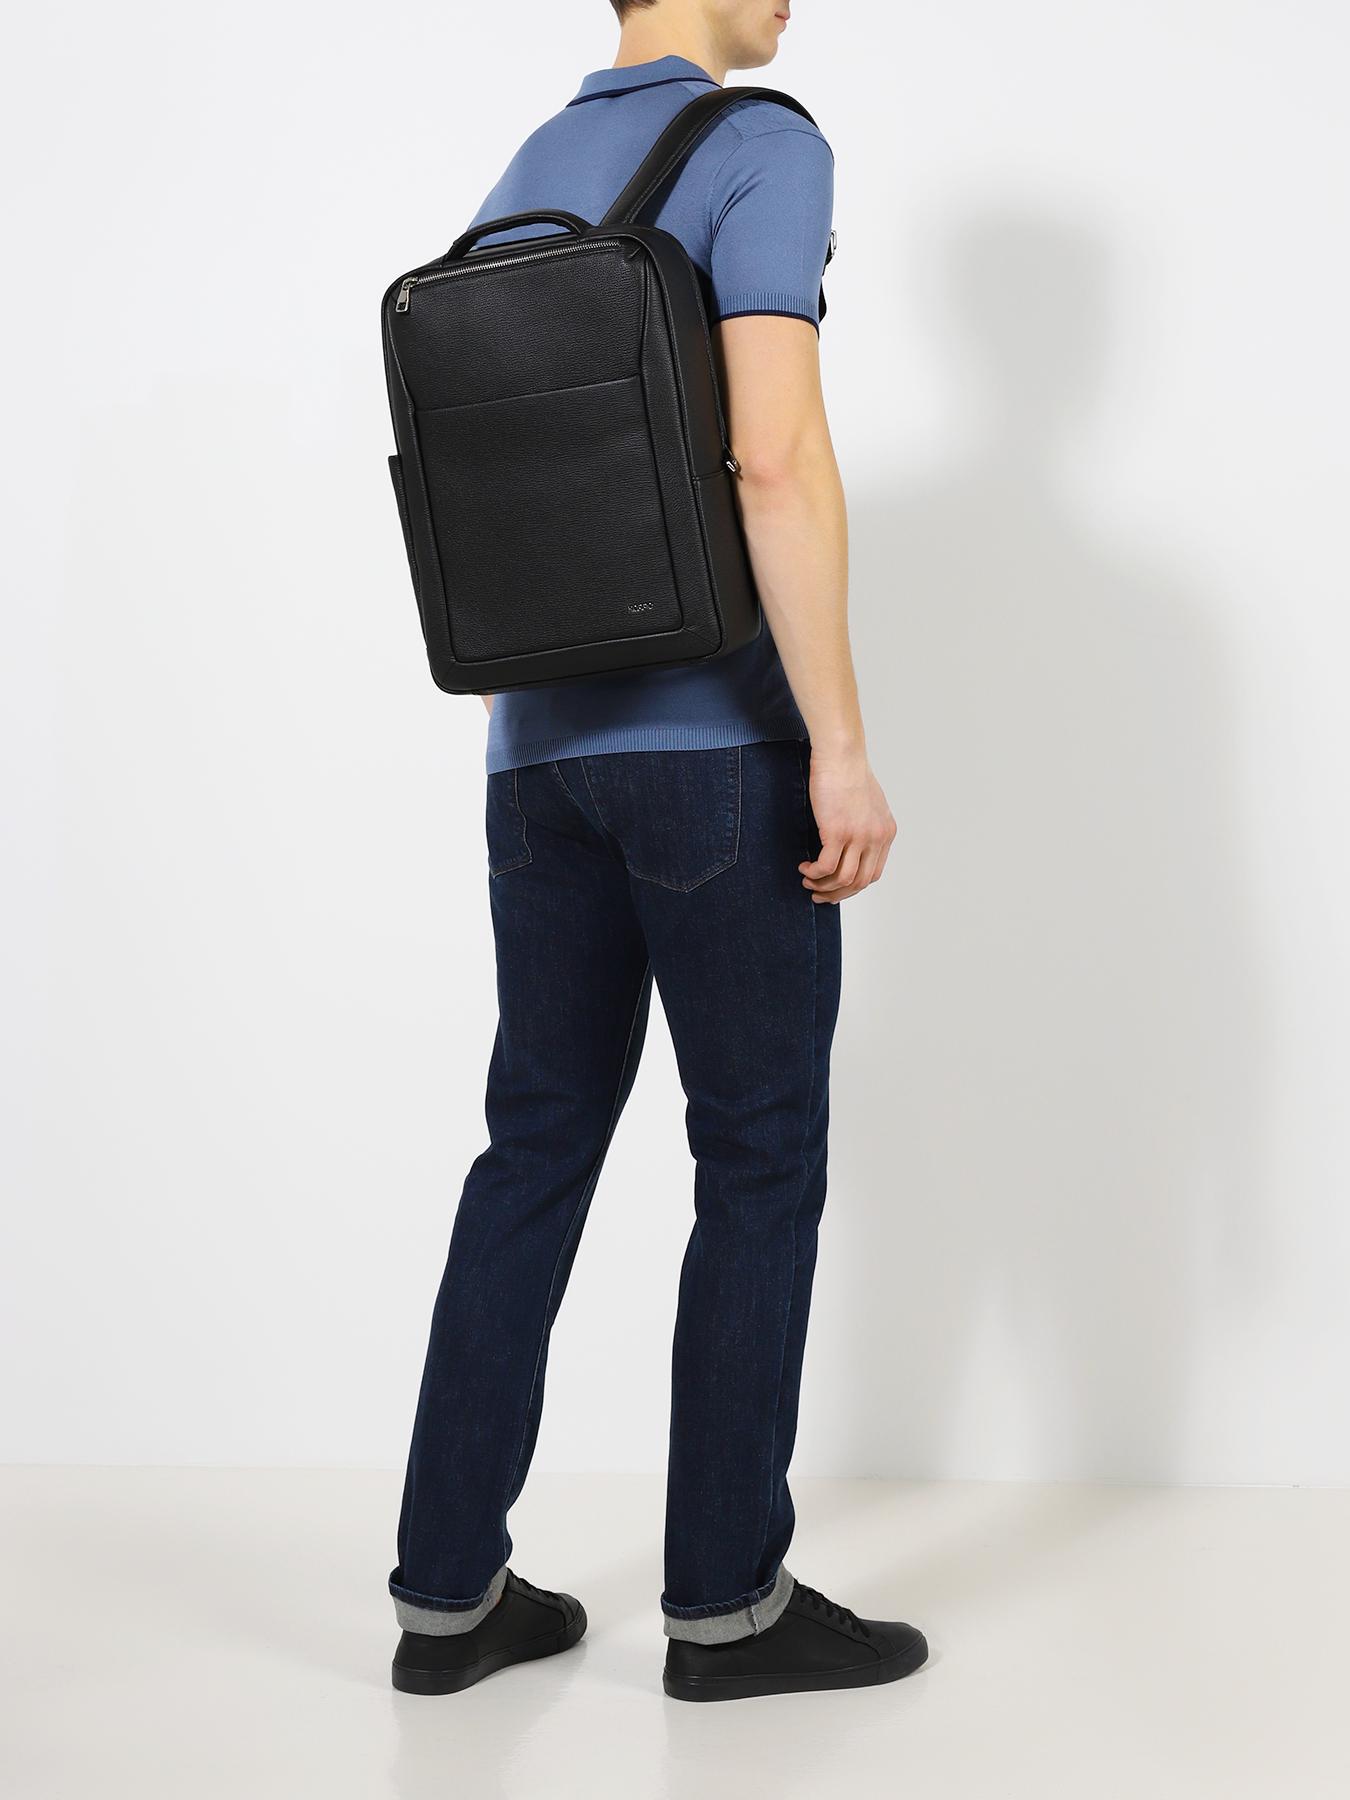 Рюкзак Korpo Мужской рюкзак рюкзак мужской vibe outca1813vi blu2